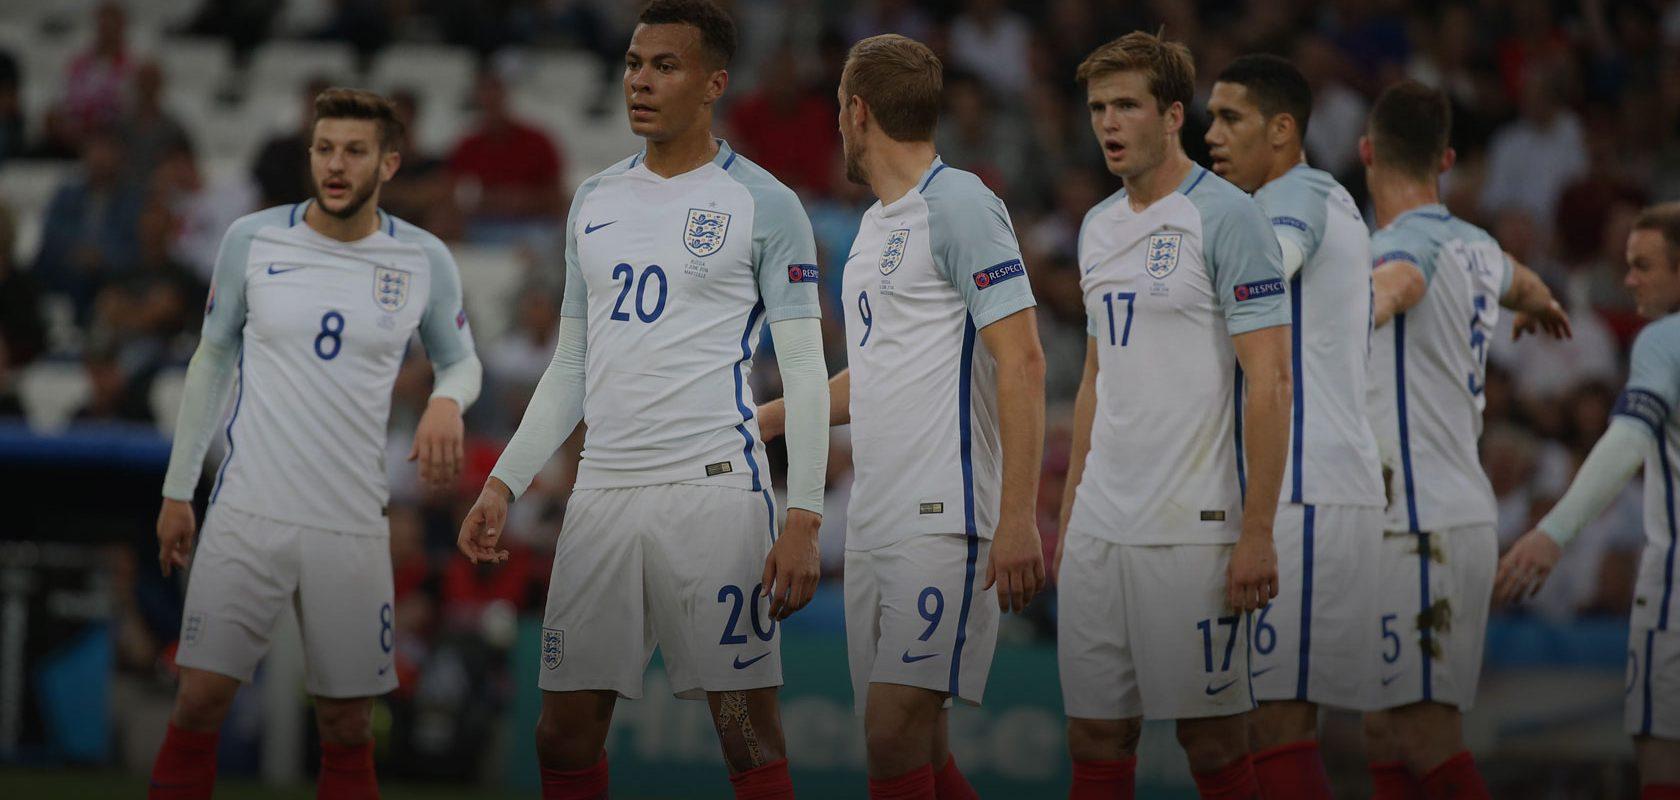 England vs Russia, Euro 2016. Photo: m.iacobucci.tiscali.it